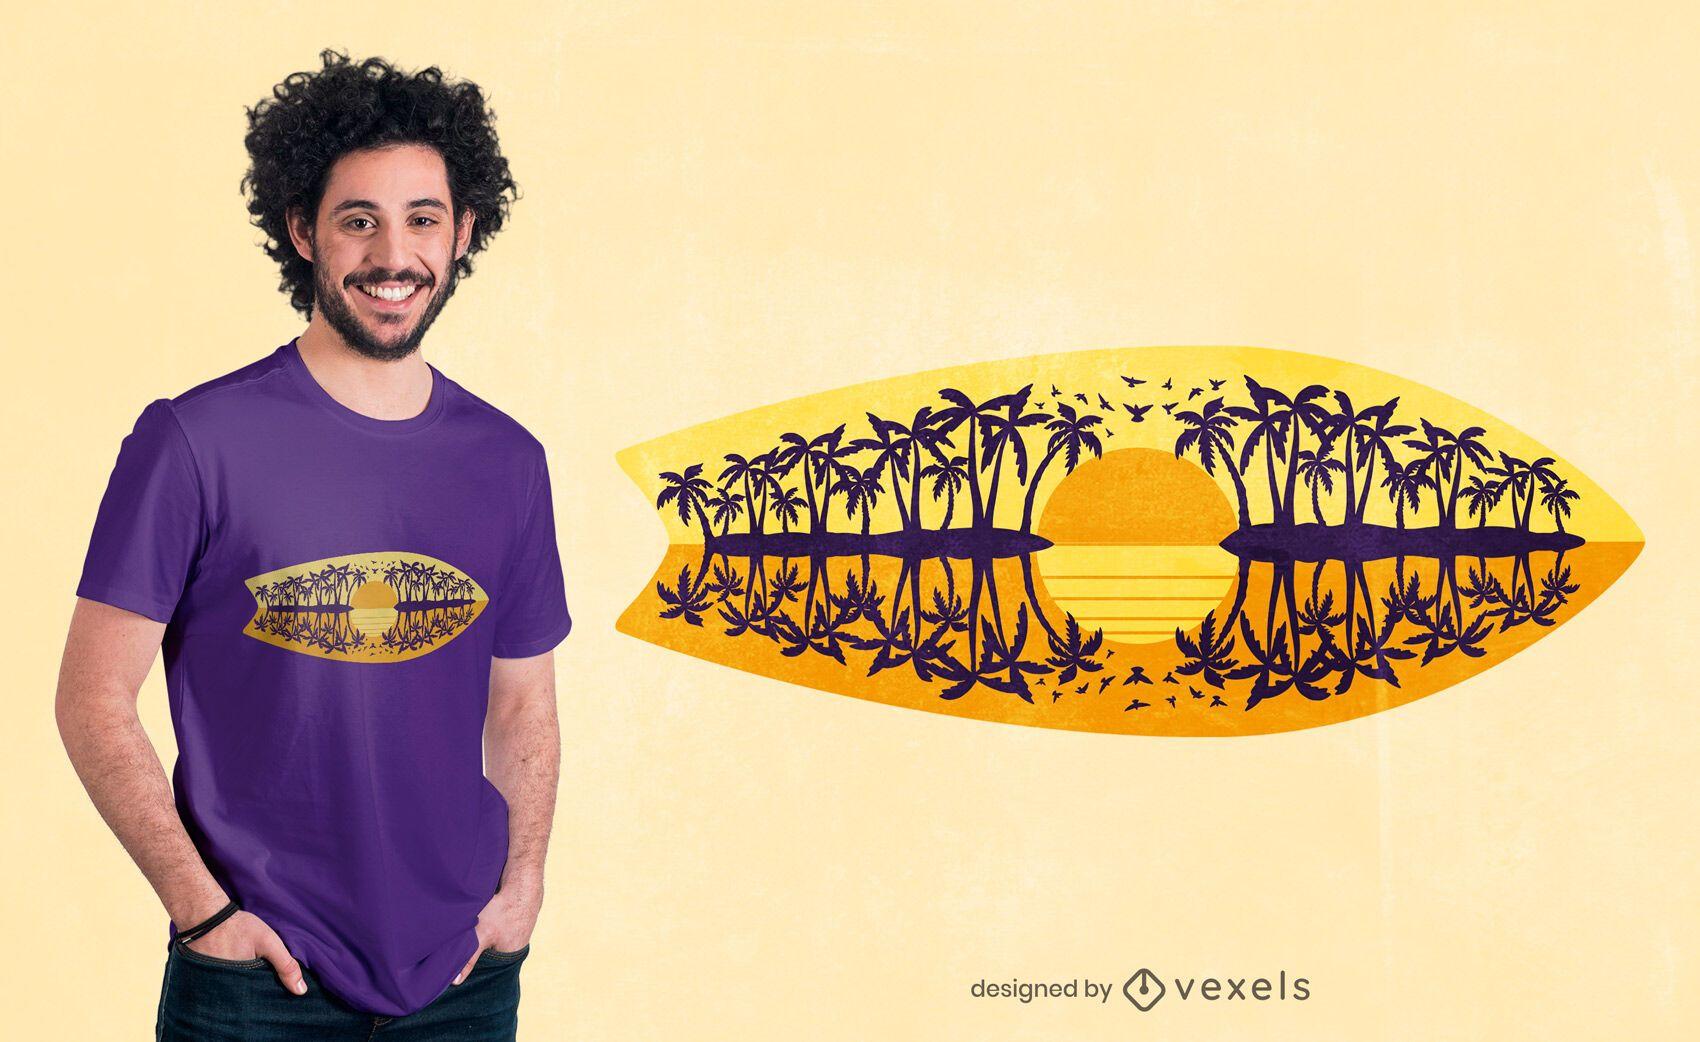 Surfboard reflection t-shirt design